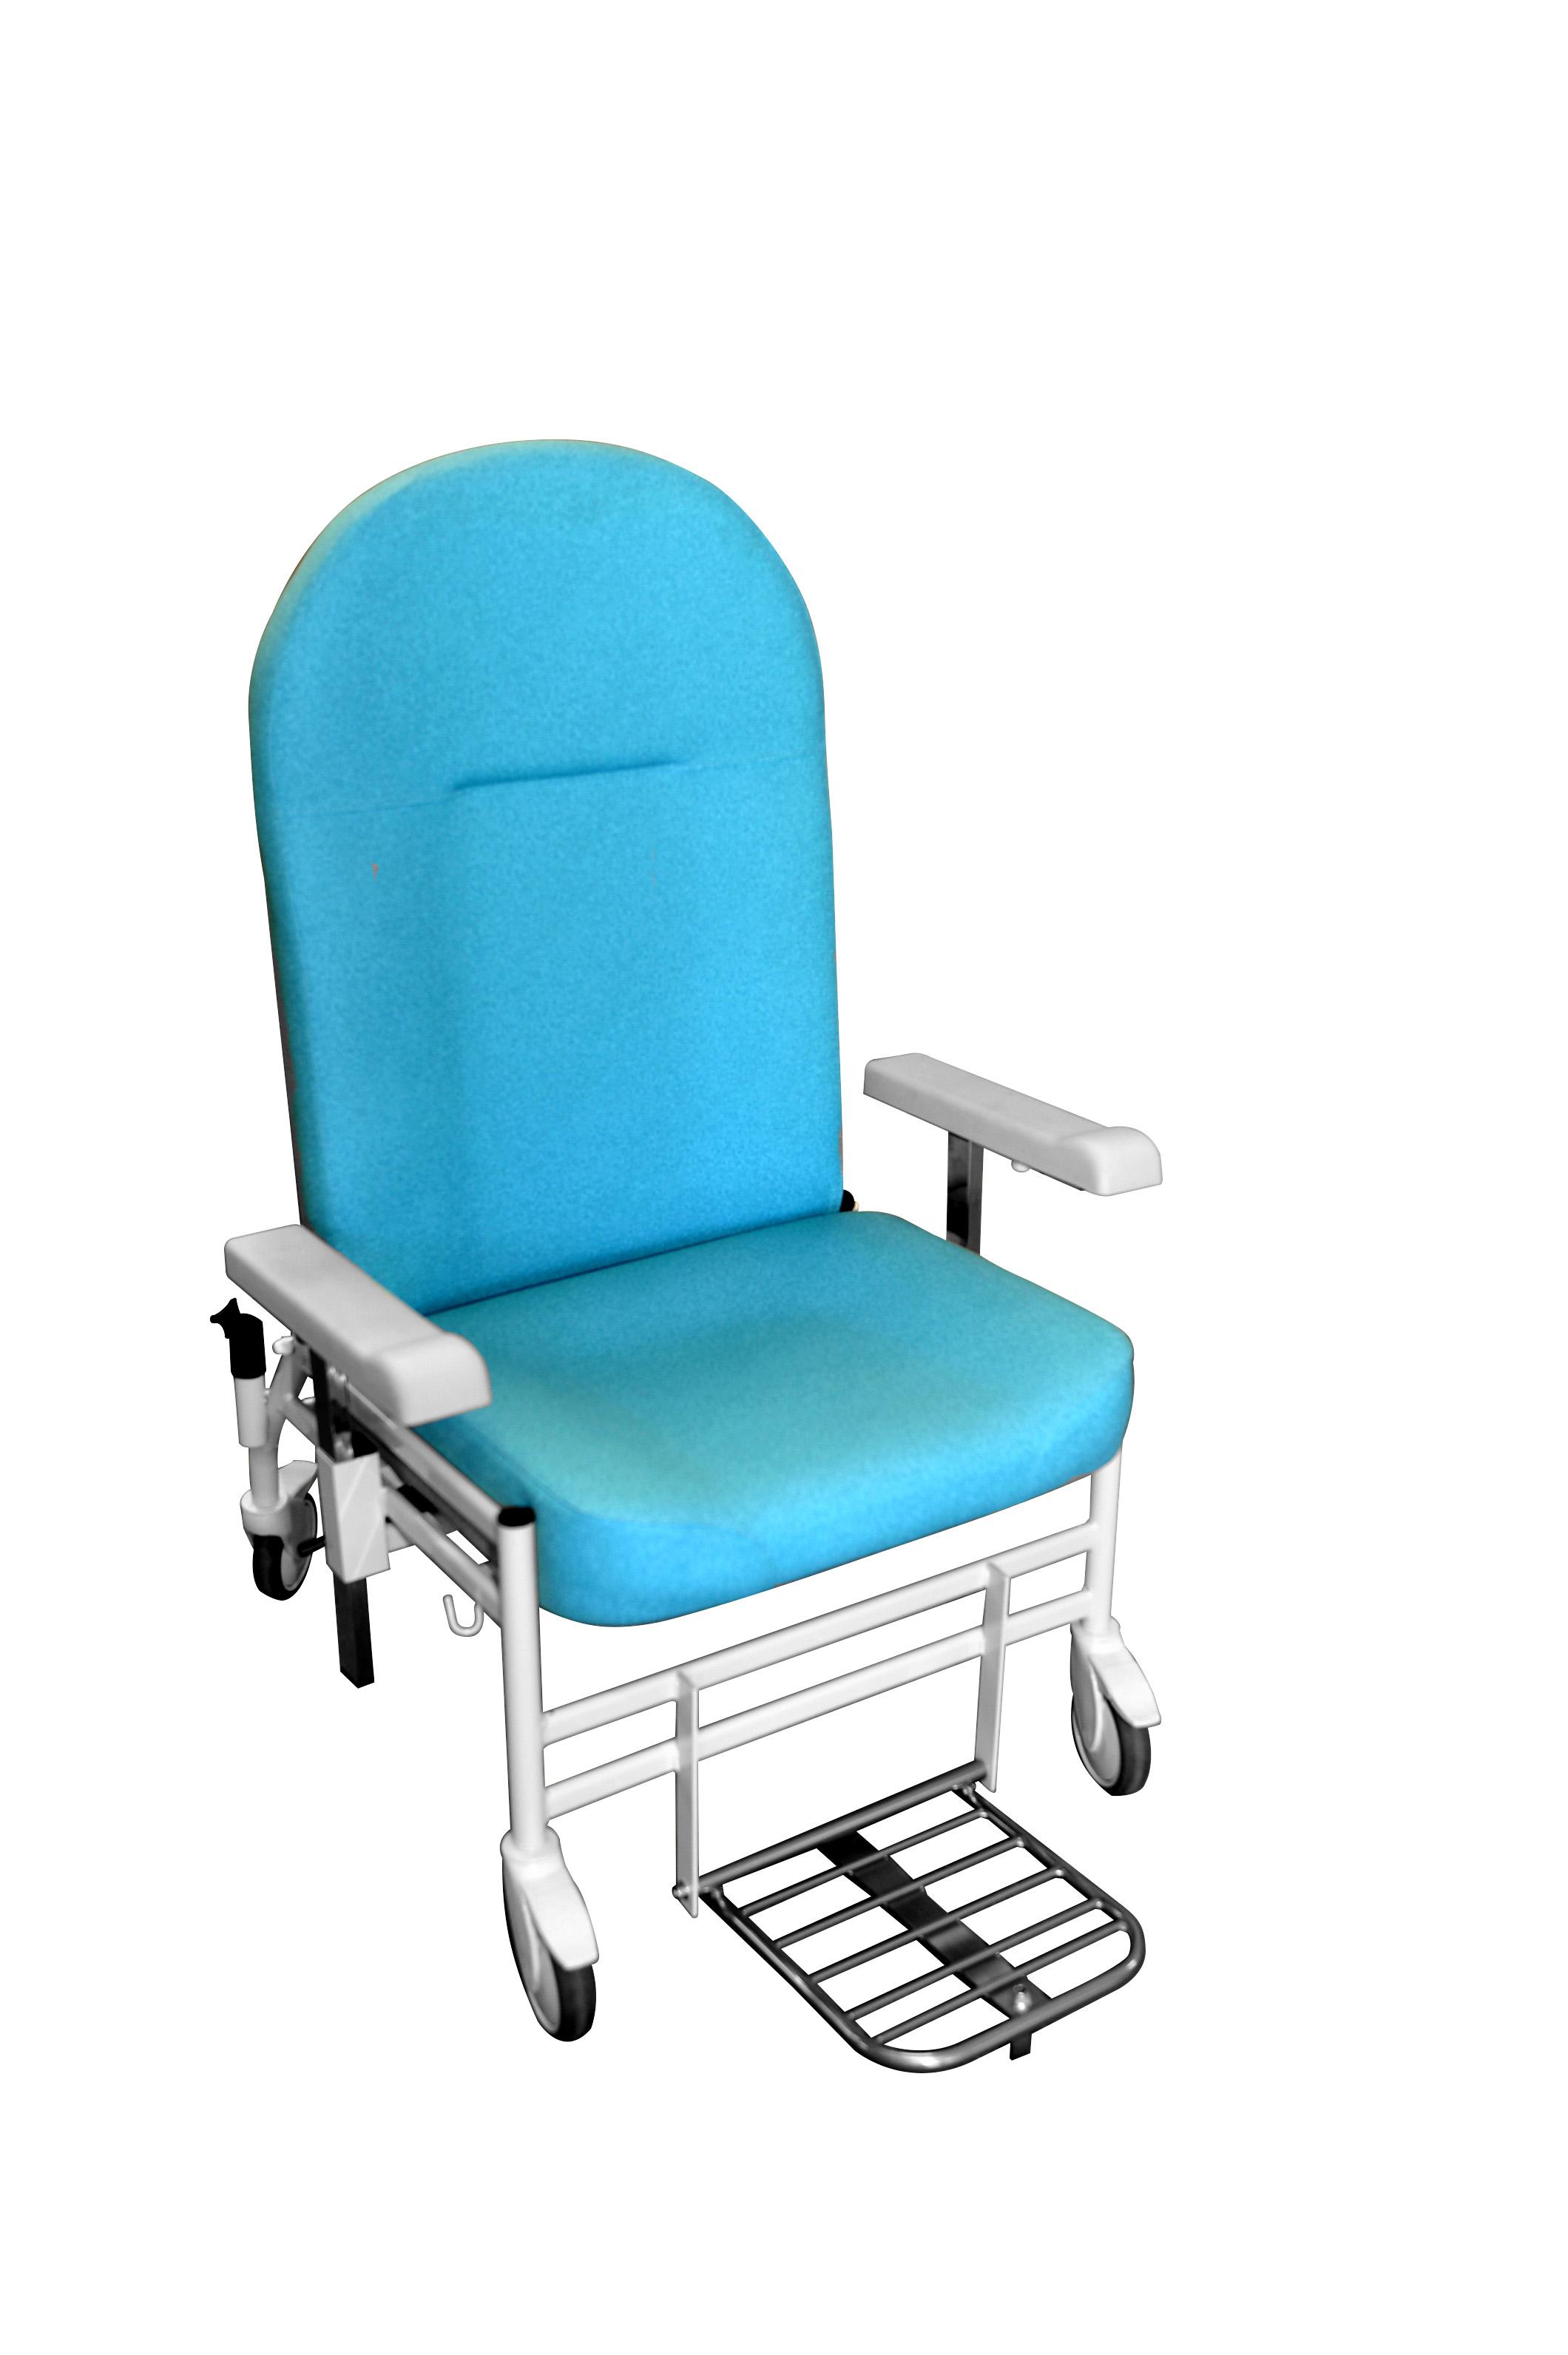 vog m dical mobilier et mat riel m dical 80170 caix. Black Bedroom Furniture Sets. Home Design Ideas